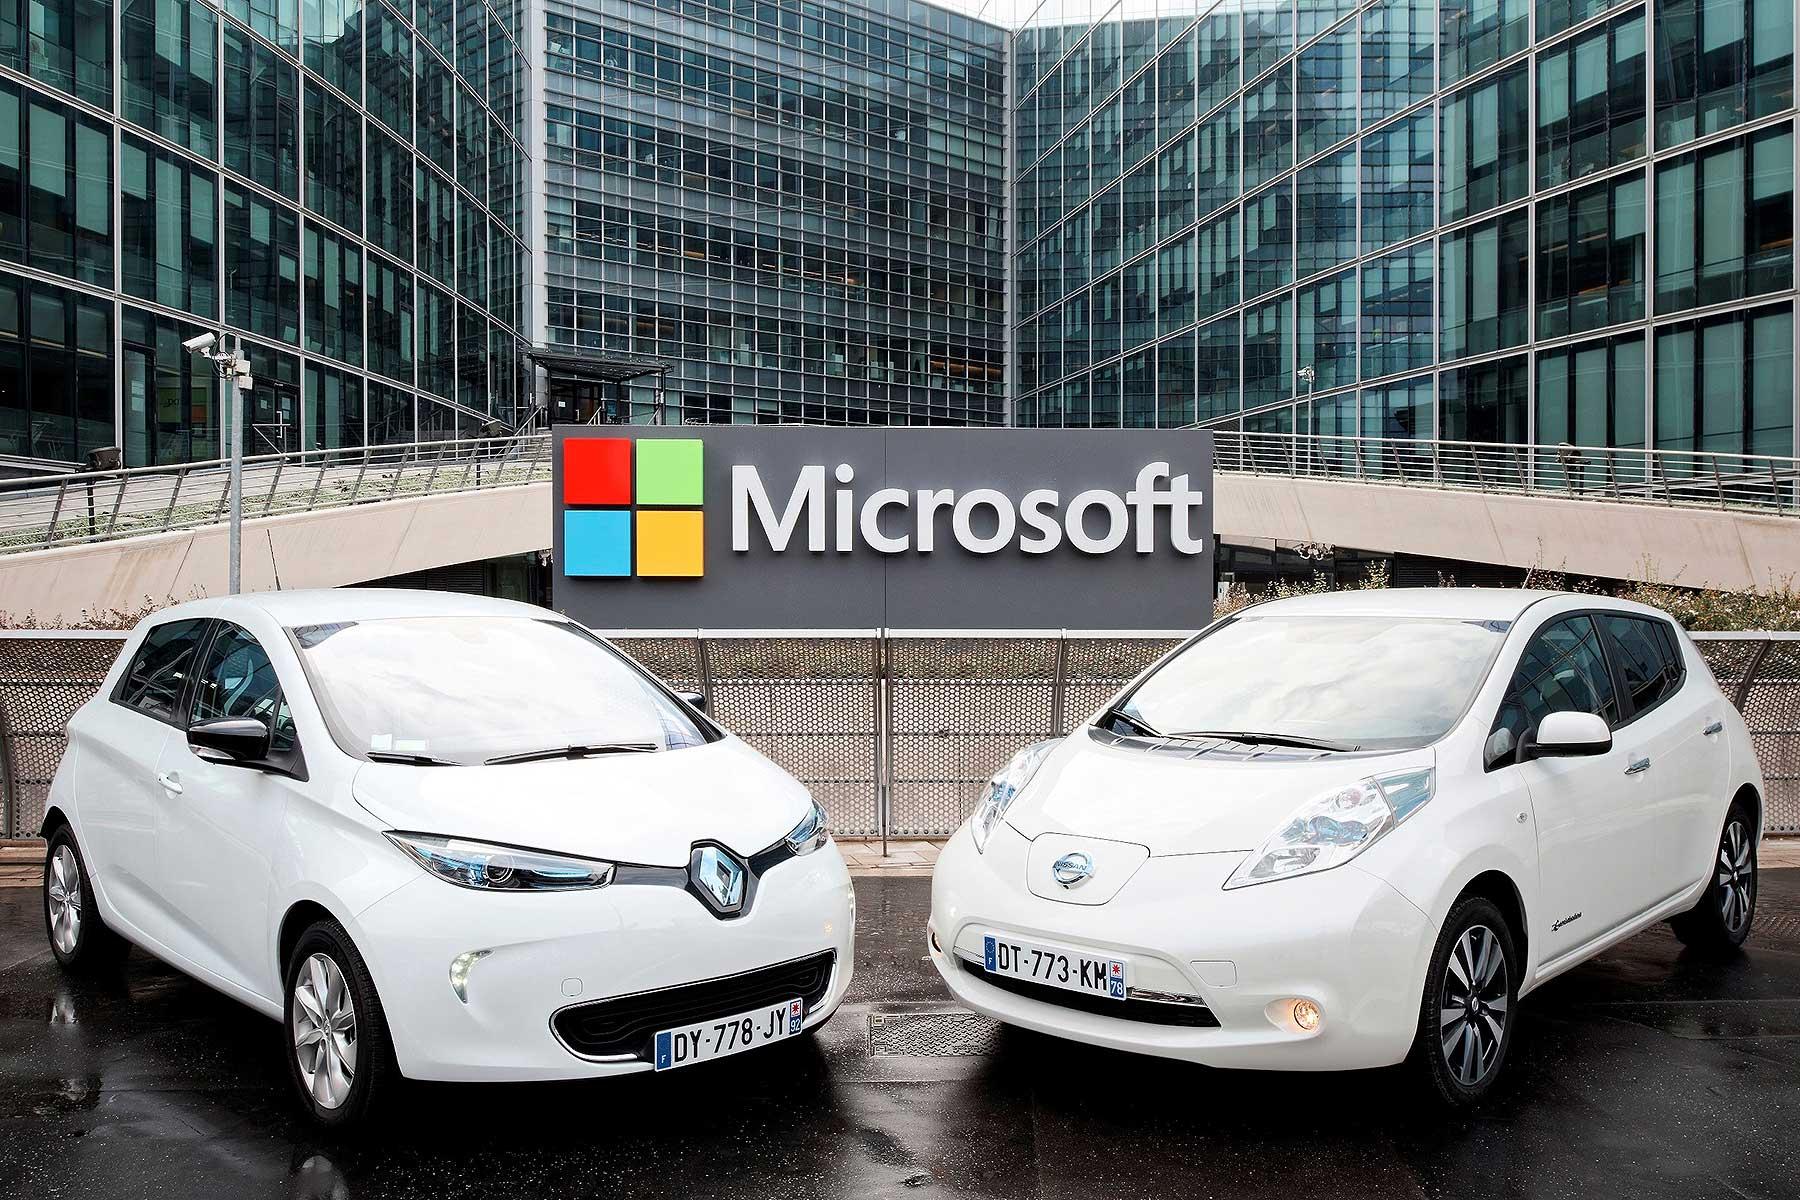 Renault-Nissan and Microsoft